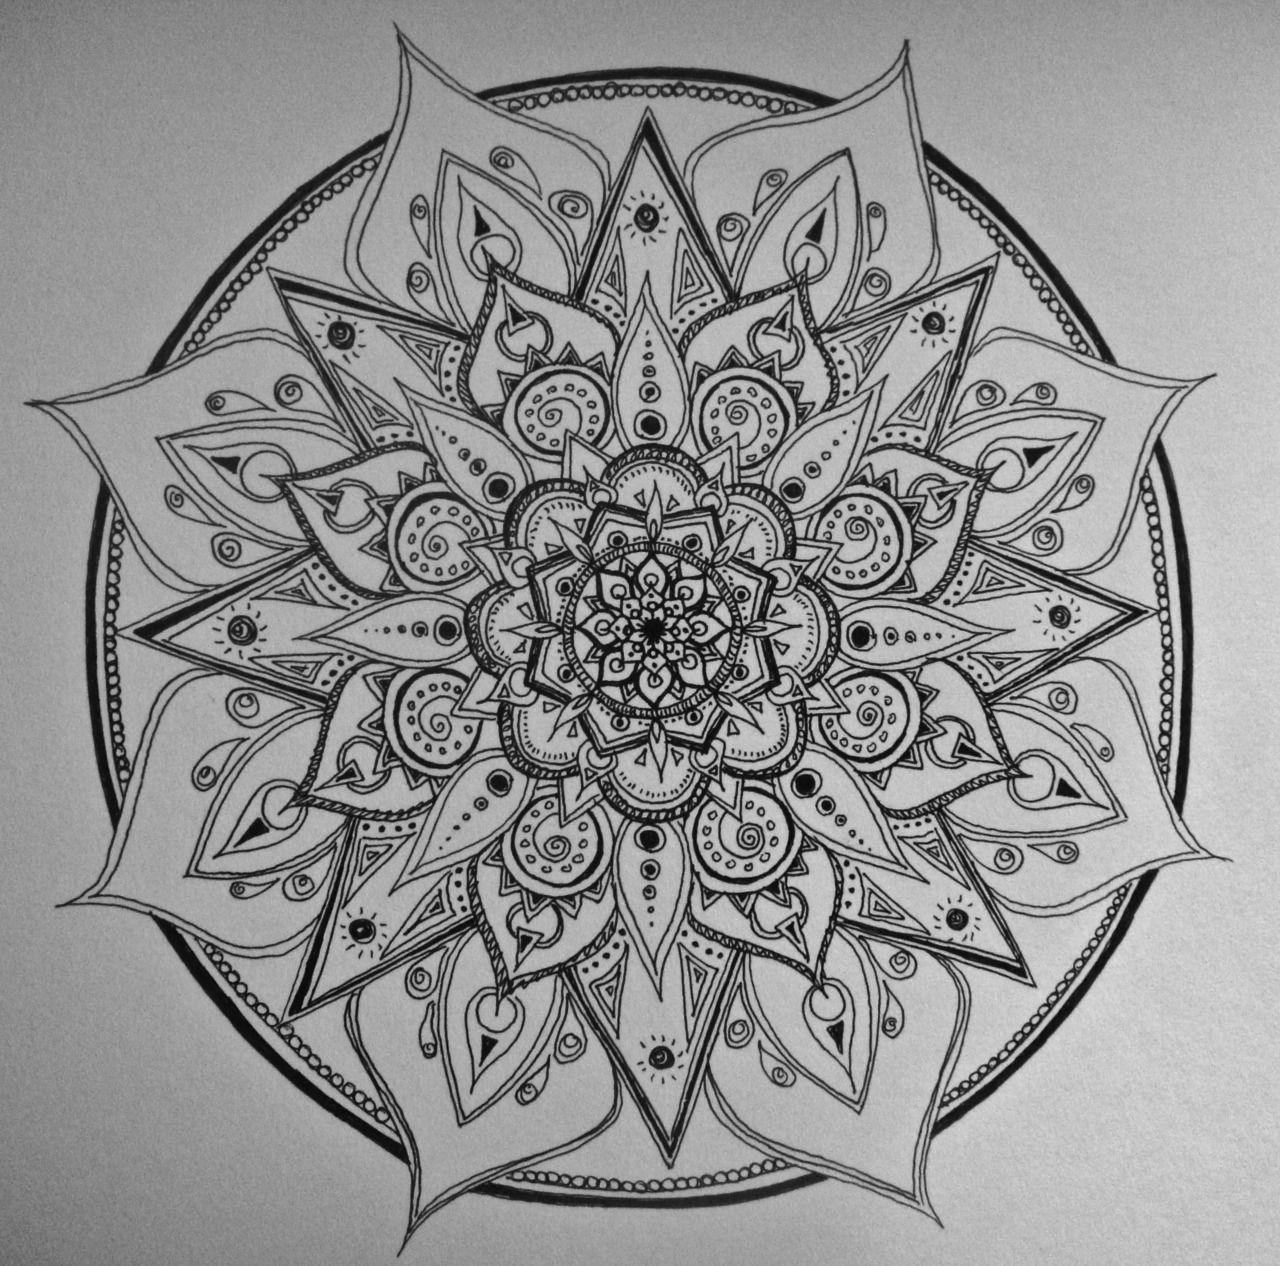 Mandala Tattoo Design On Pinterest: View Thousands Amazing Images On Hdimagelib.com